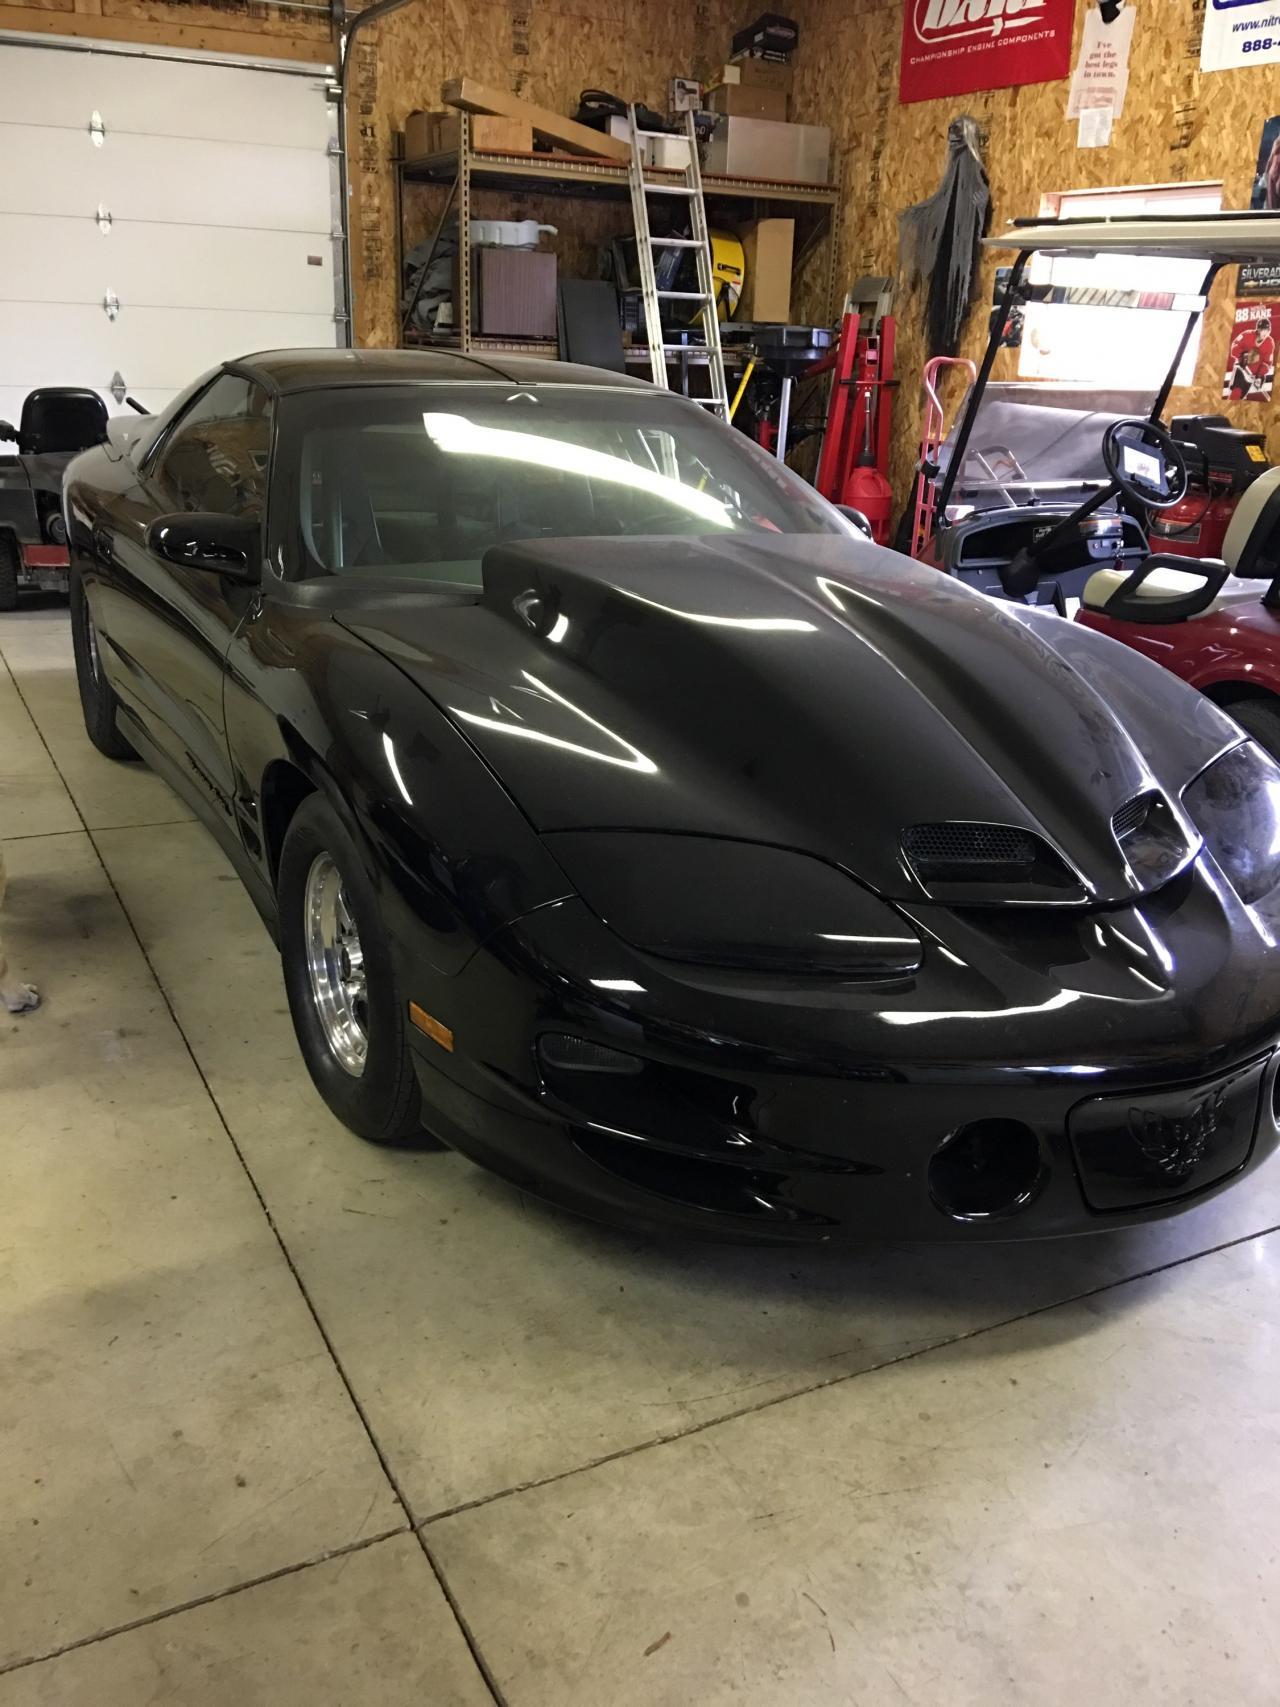 1998 Trans Am Drag Car For Sale